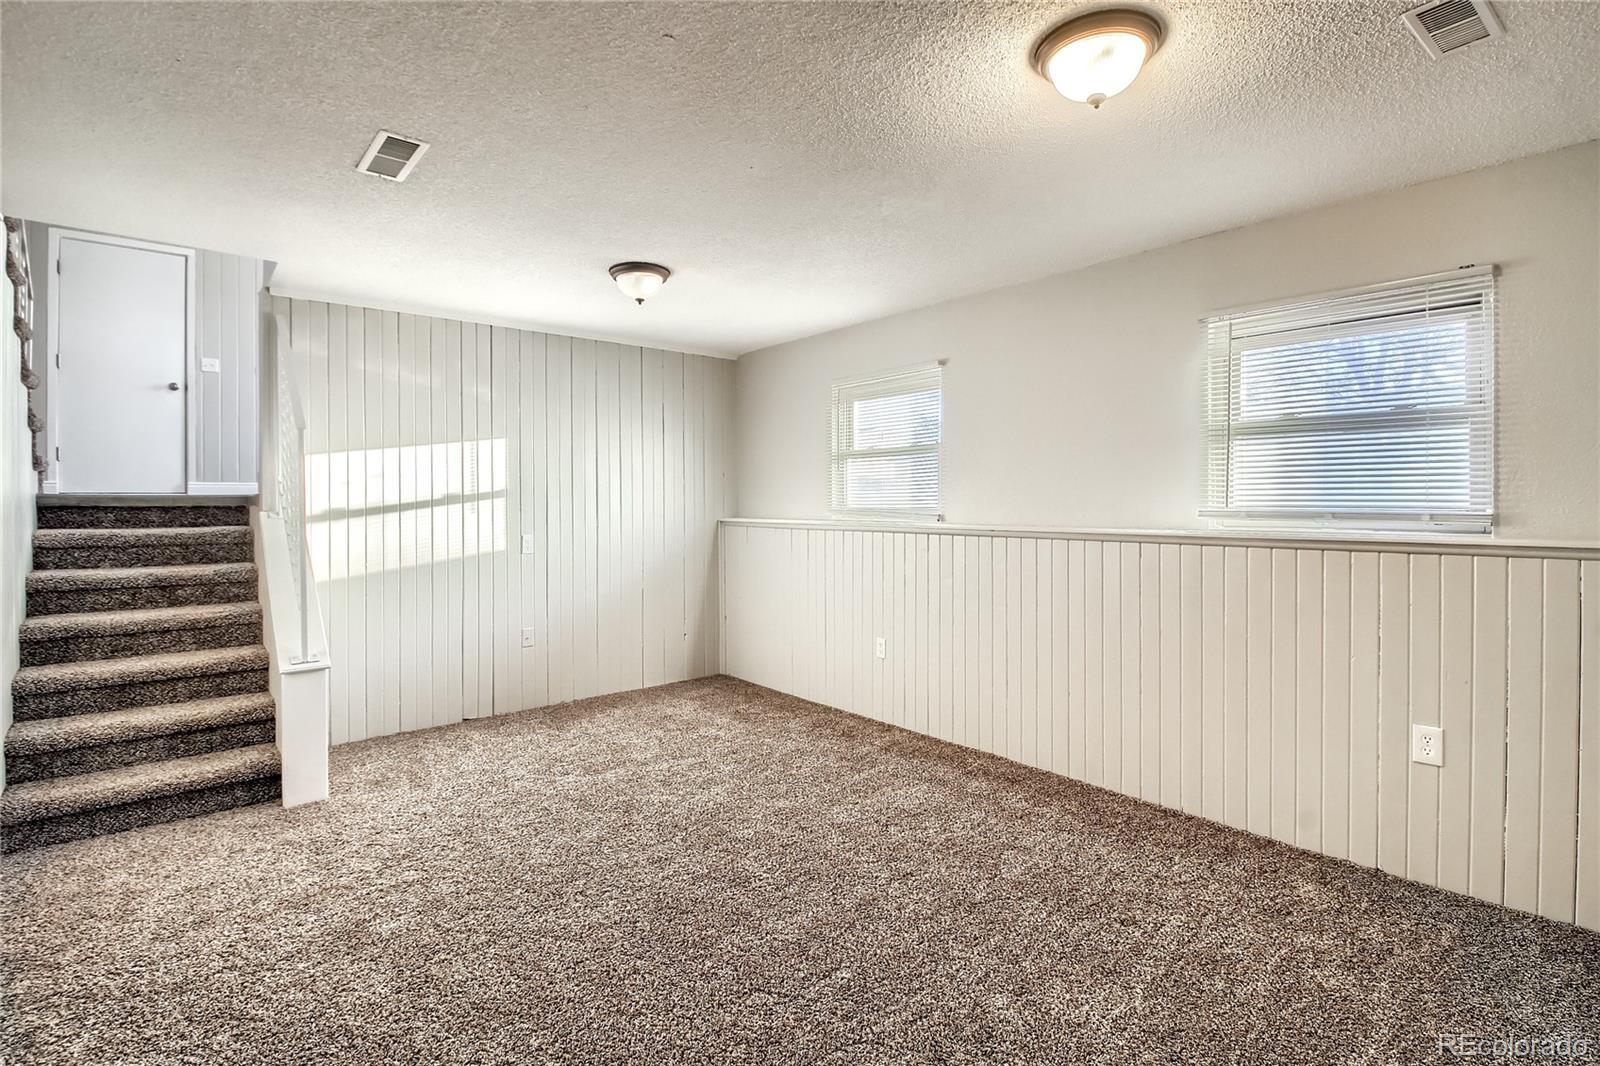 MLS# 8804701 - 28 - 20615 E Coolidge Place, Aurora, CO 80011